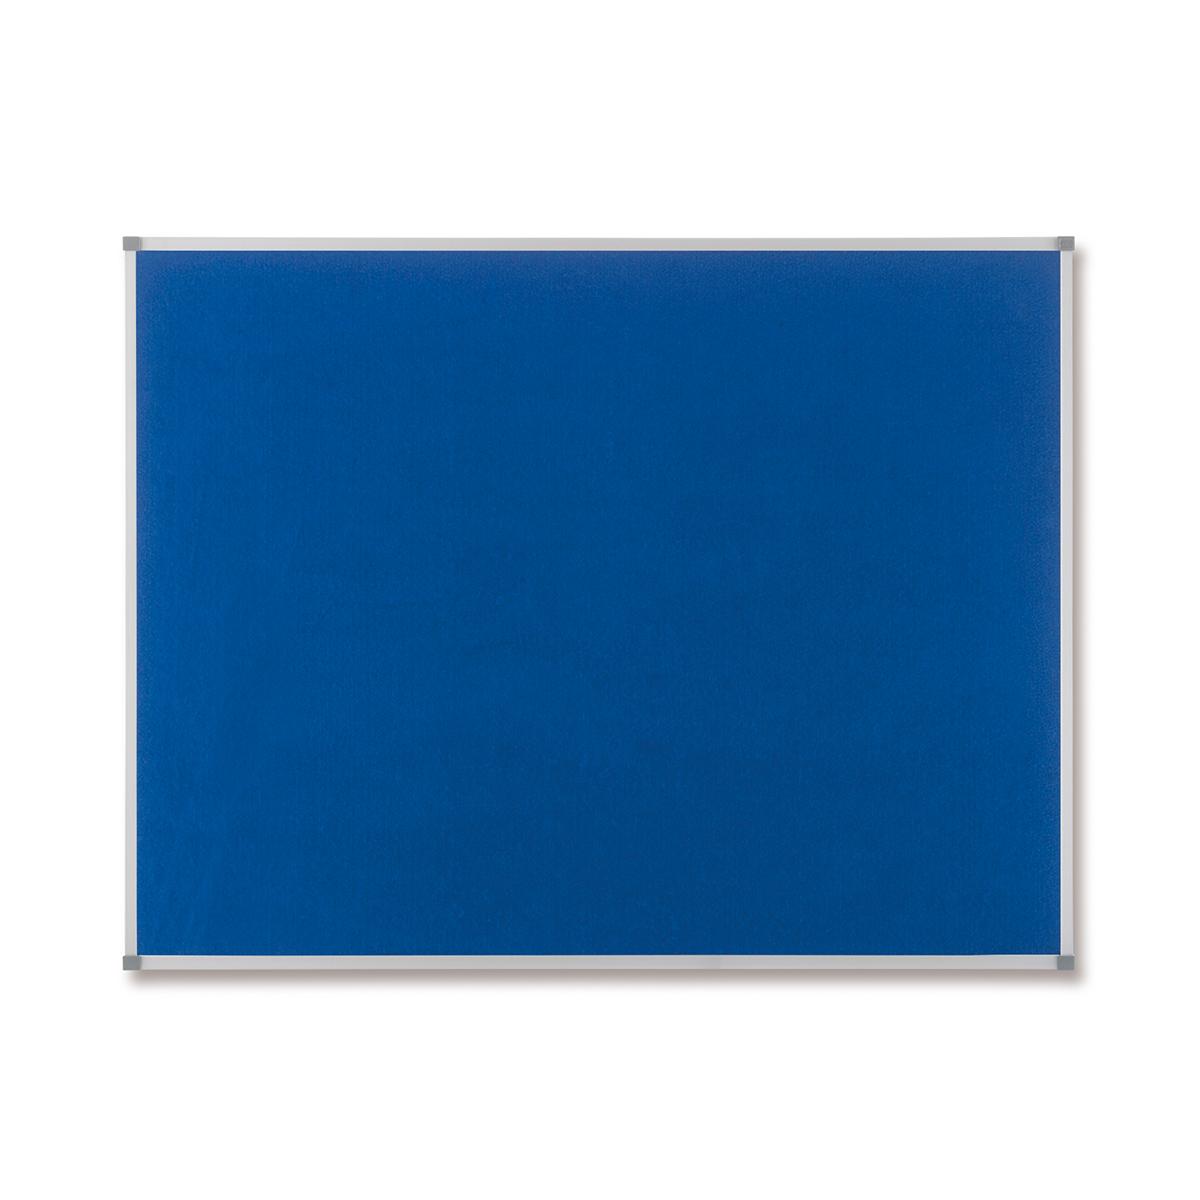 Nobo 1900916 Classic Blue Felt Noticeboard 1200 x 900mm